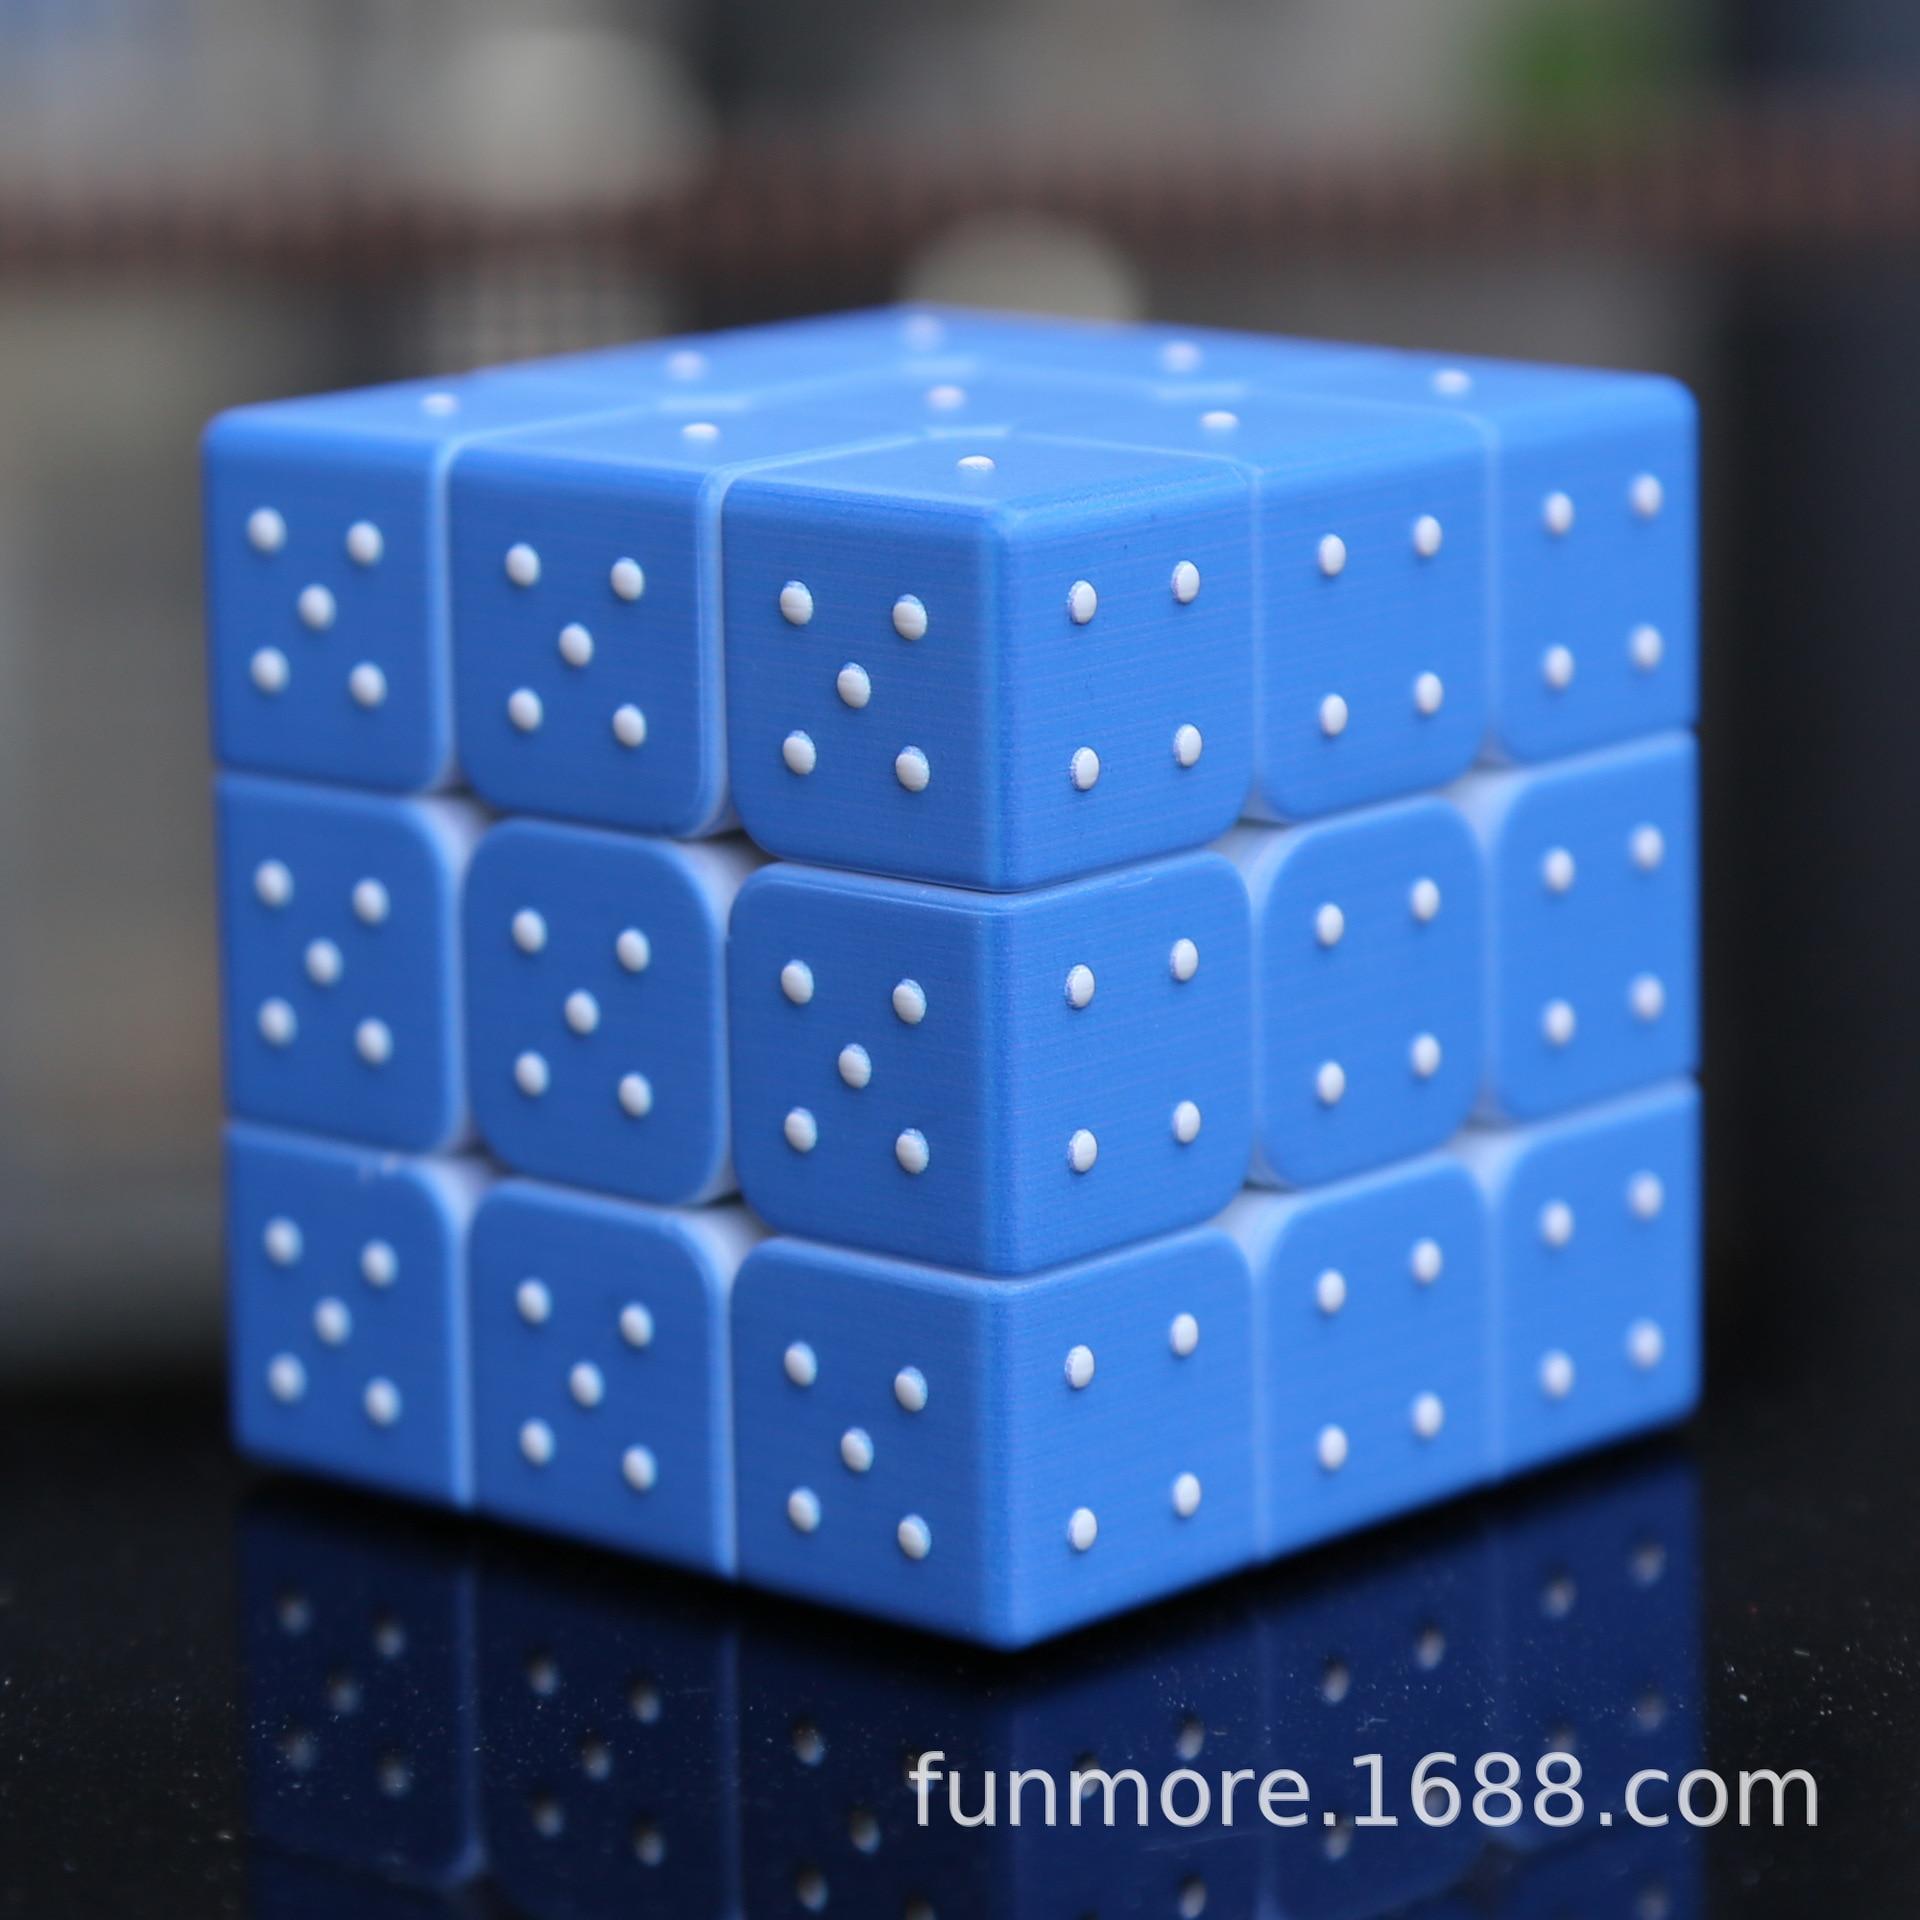 3x3x3 3D Adult Speed Twist Three-dimensional Emboss Sudoku Magic Cube Math Brain Game Blind Braille Toy